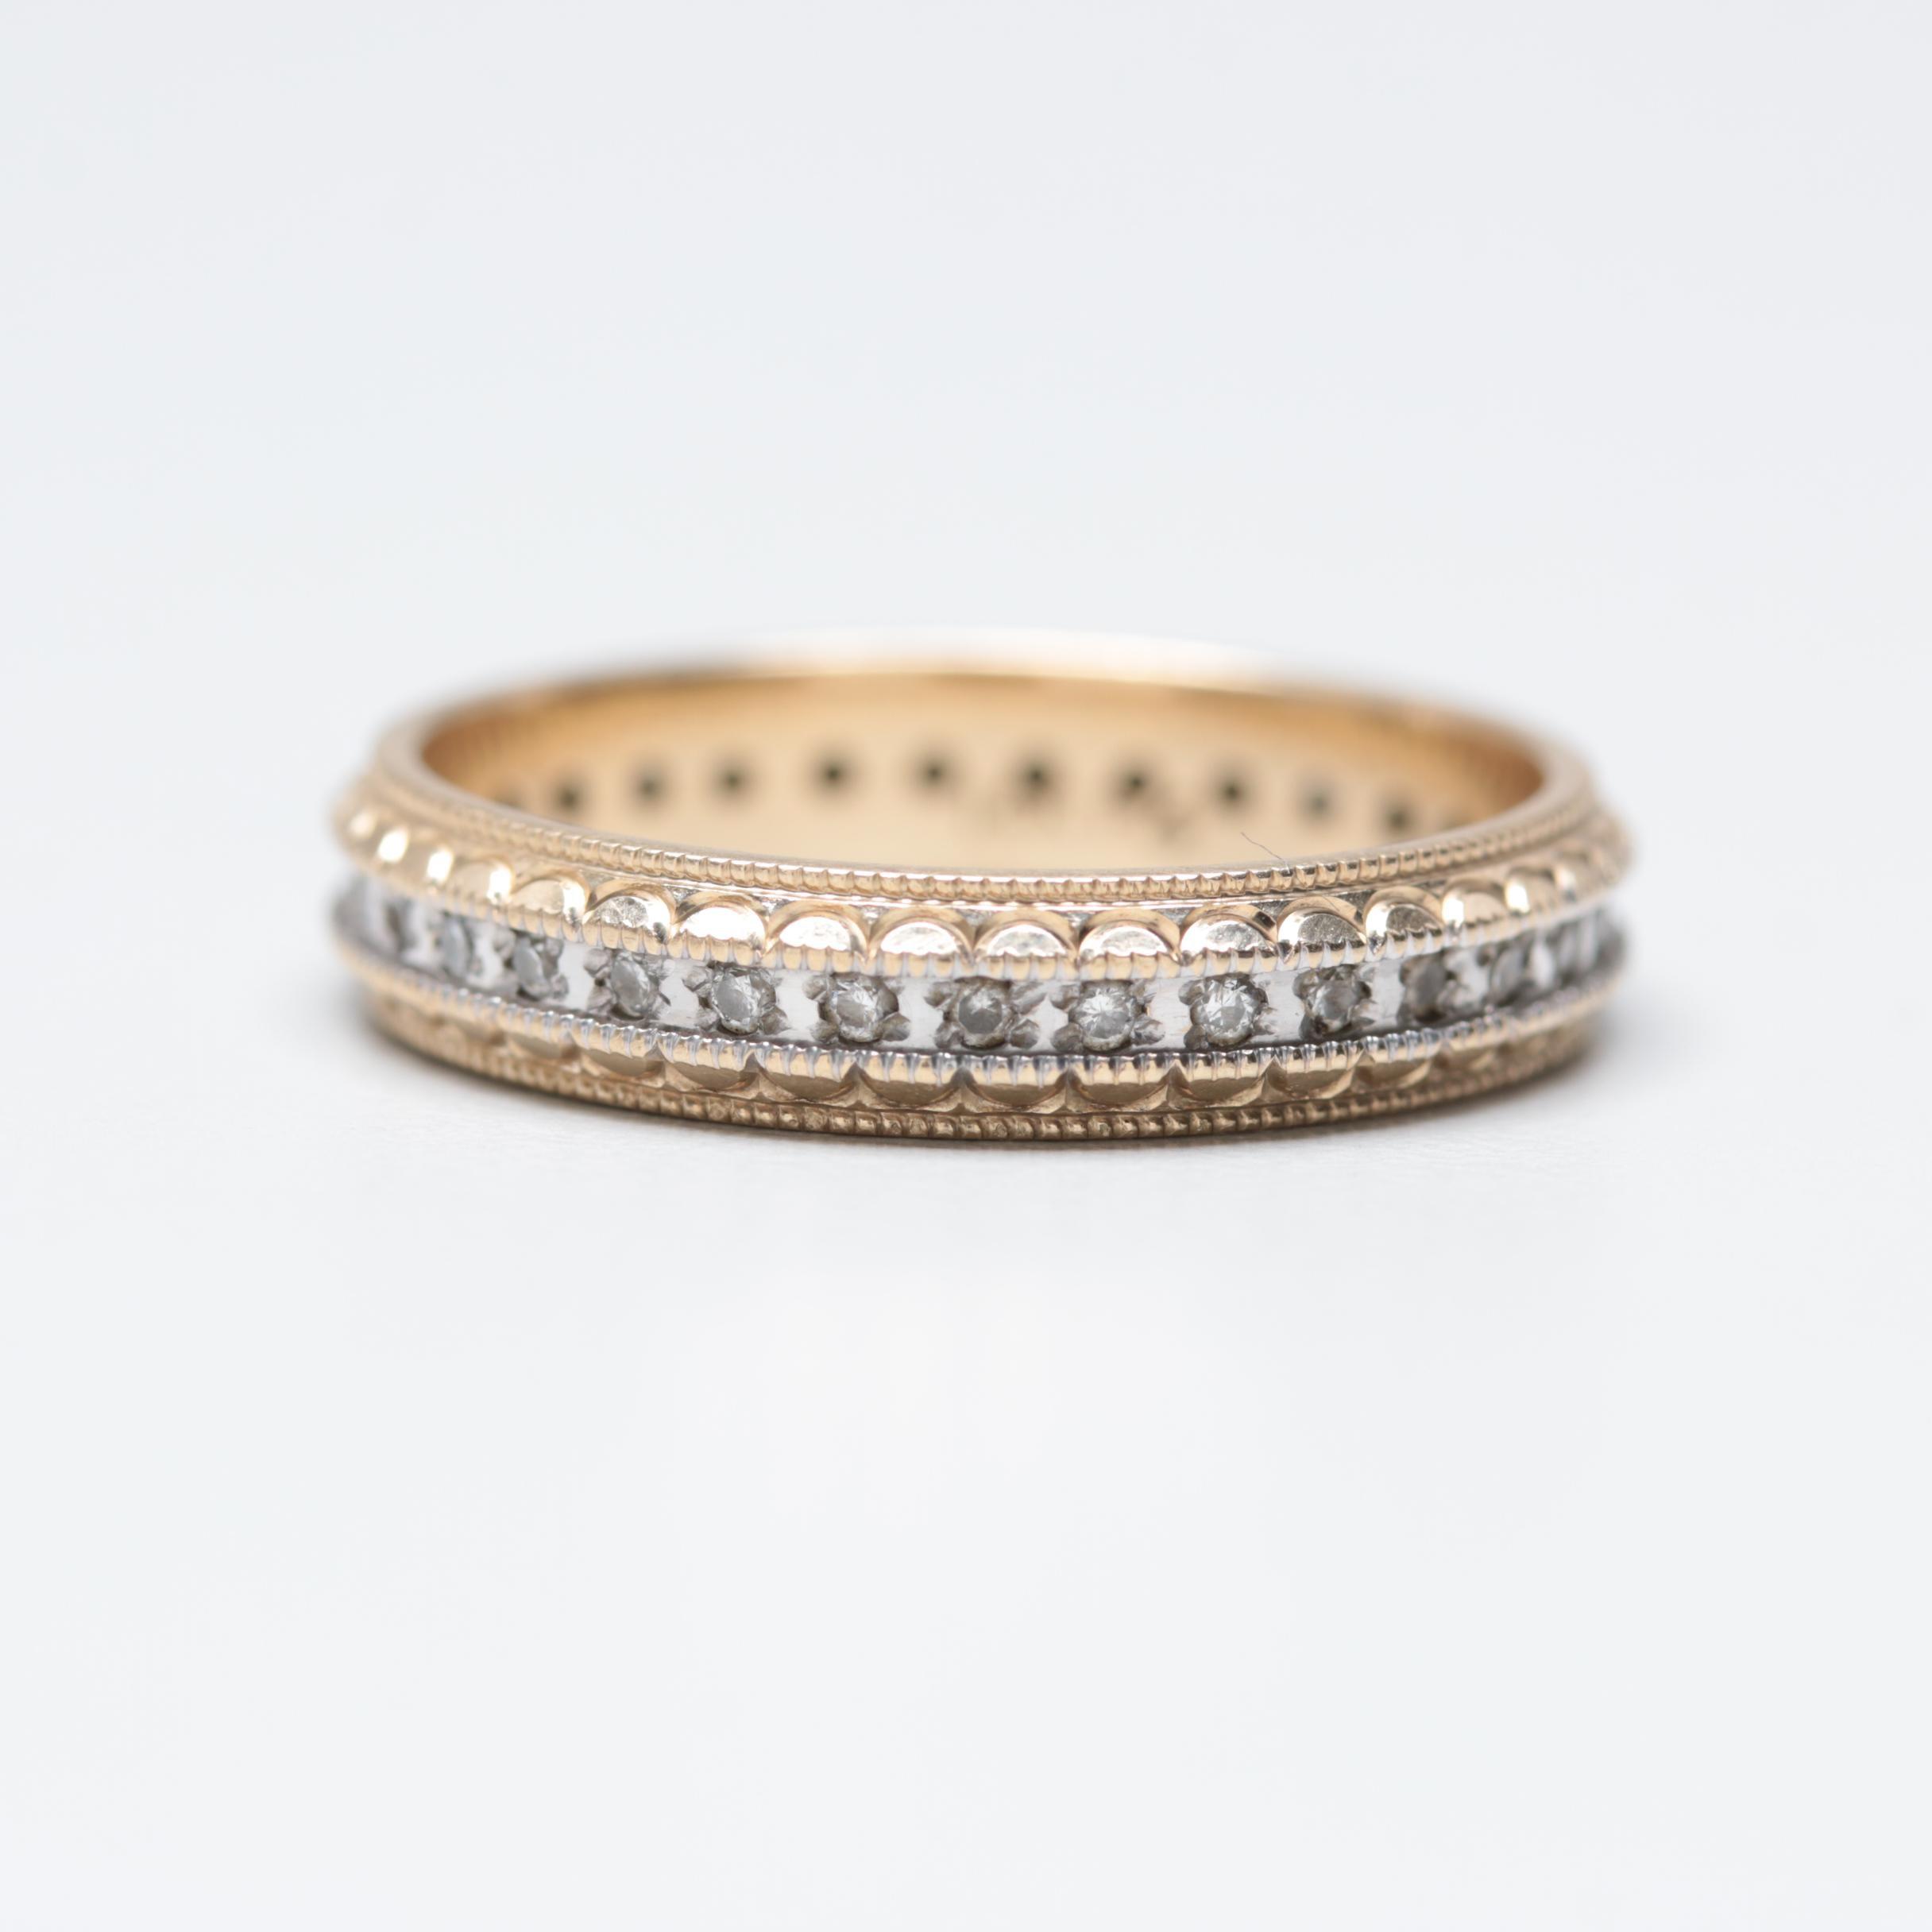 14K Yellow and White Gold Diamond Eternity Band Ring